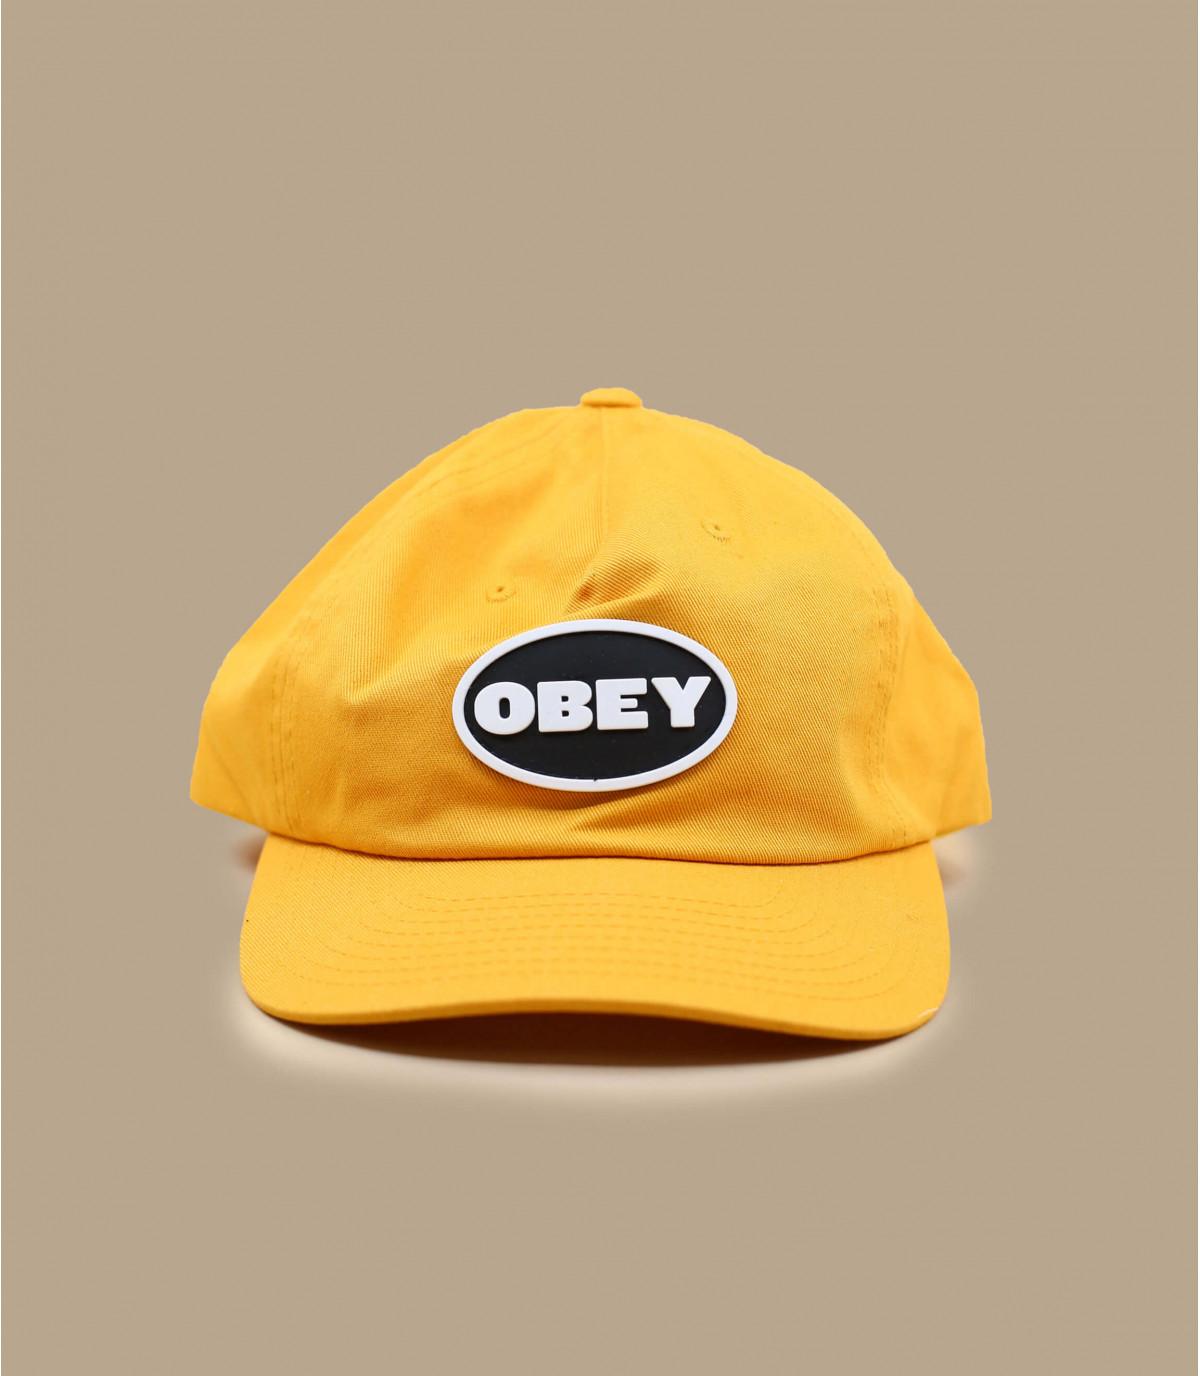 casquette 5 panel Obey jaune